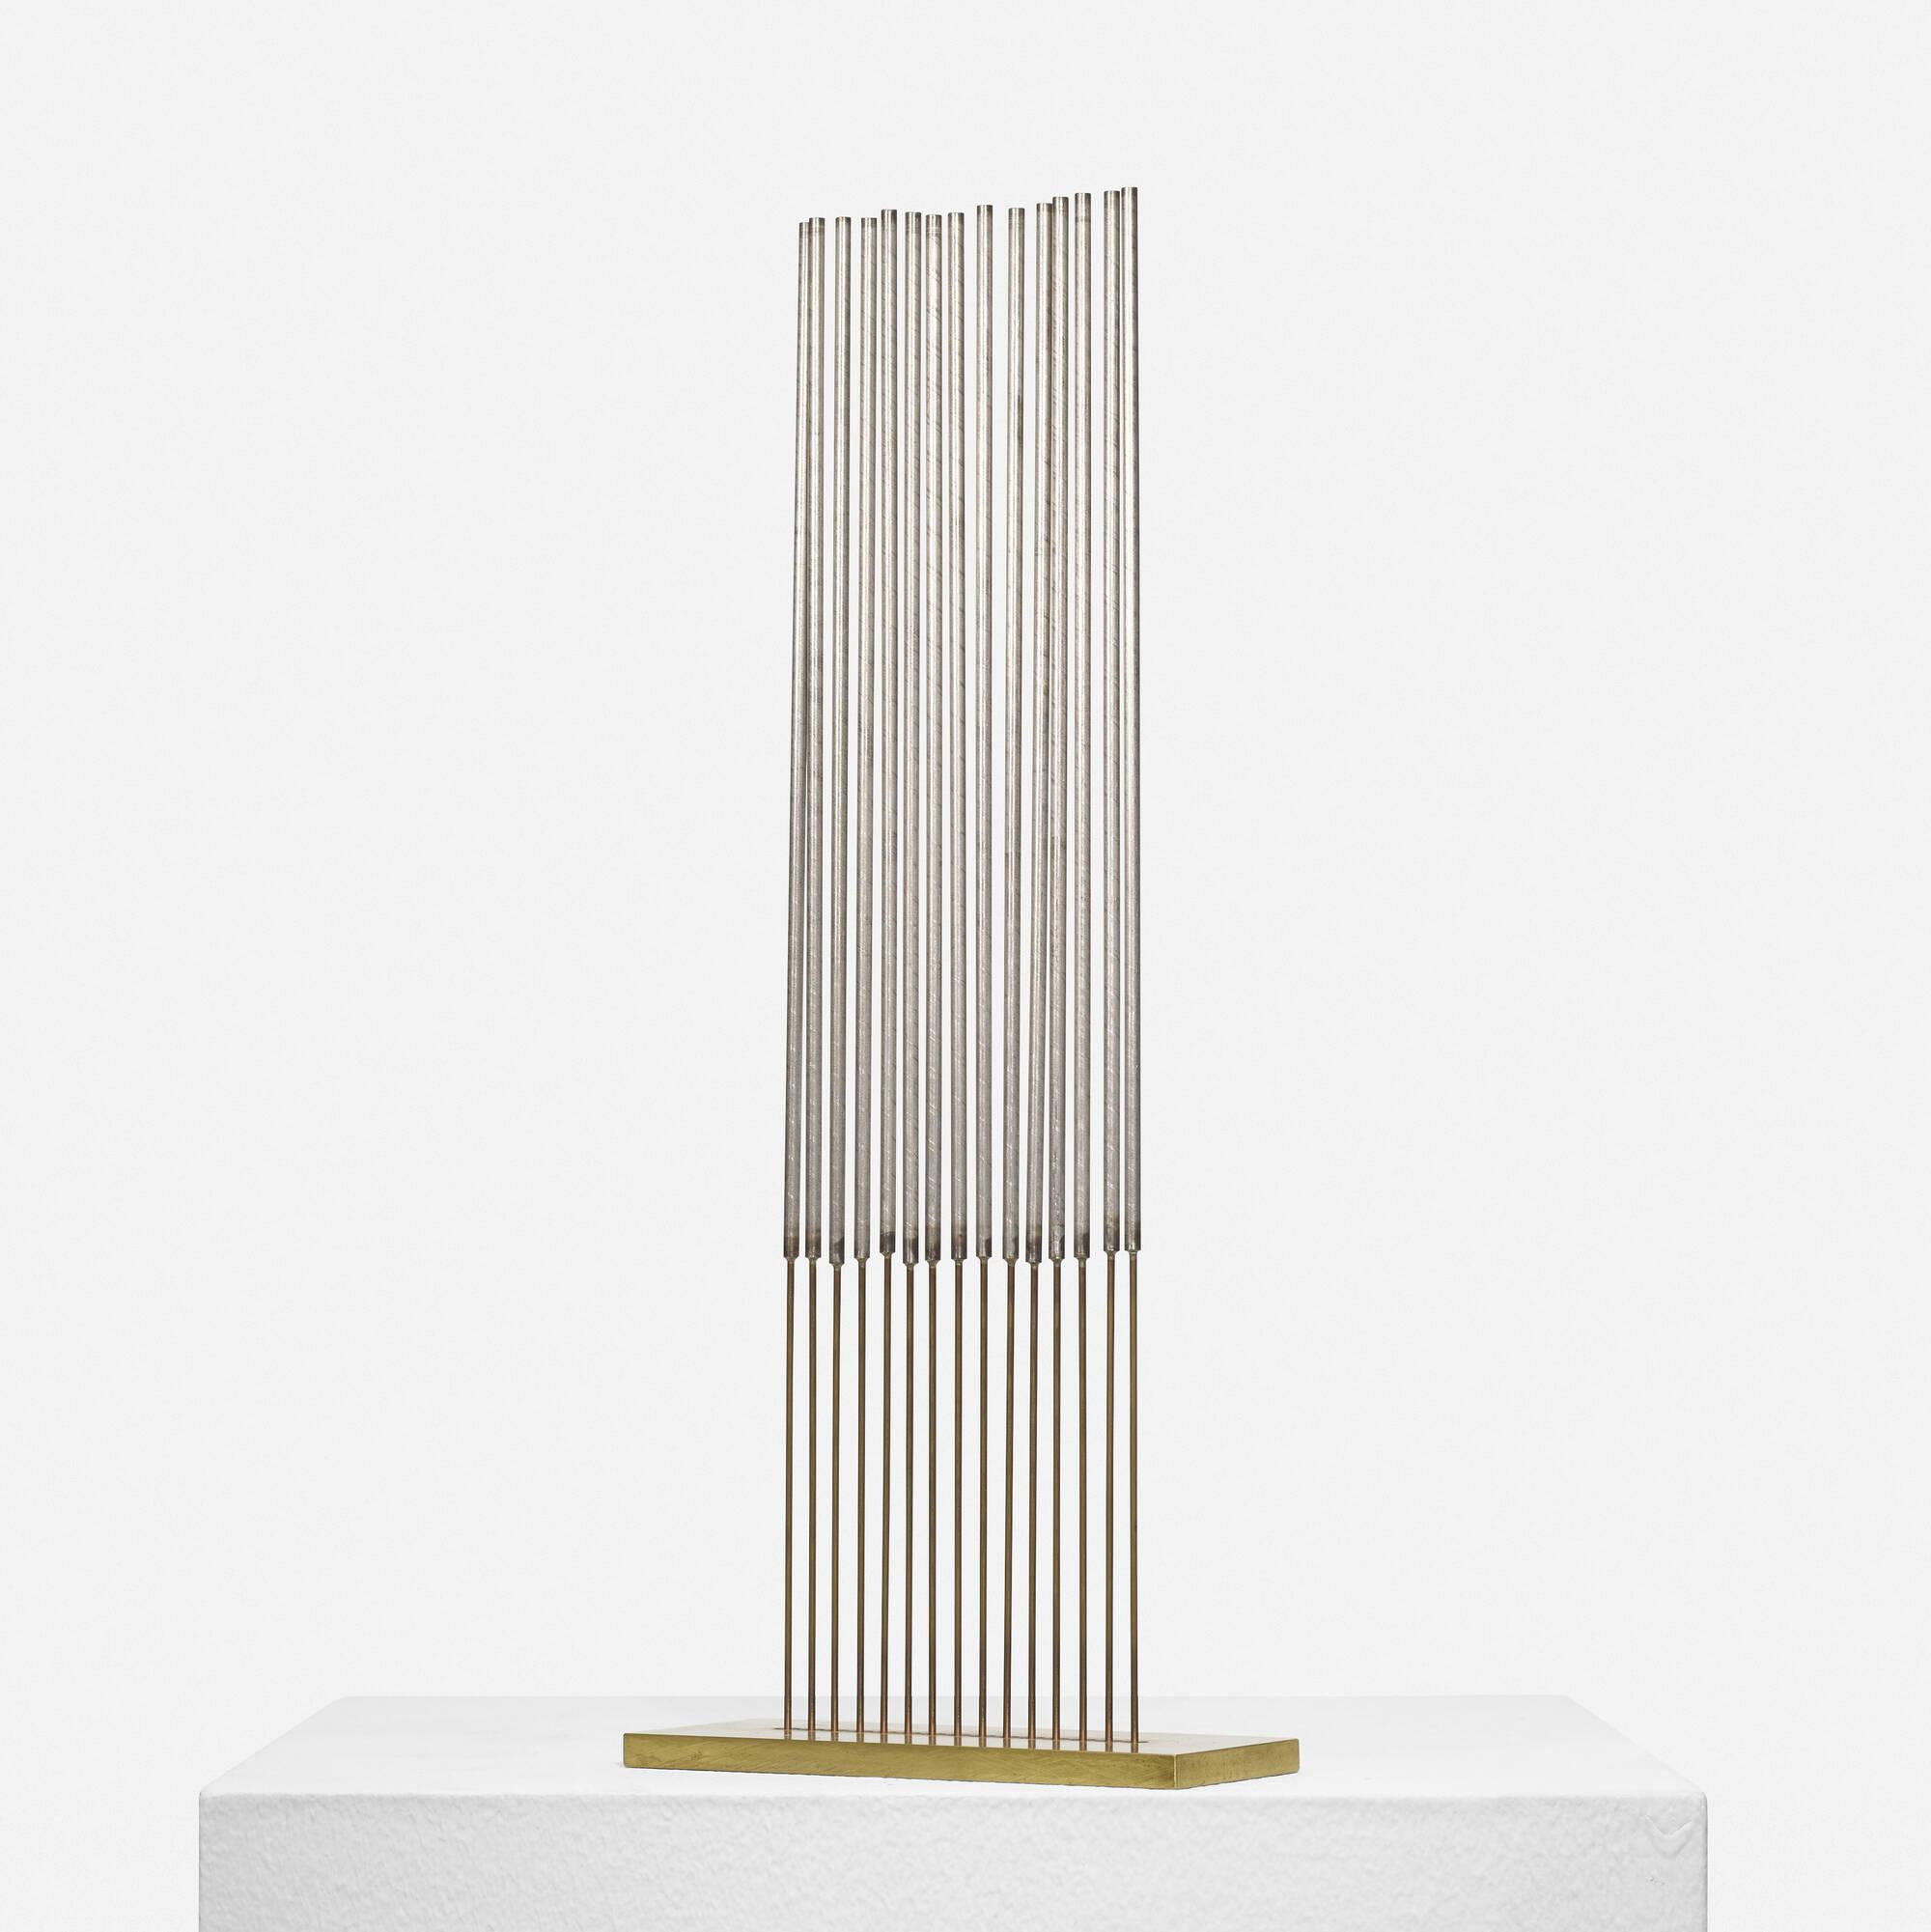 136: Harry Bertoia / Untitled (Sonambient) (2 of 3)